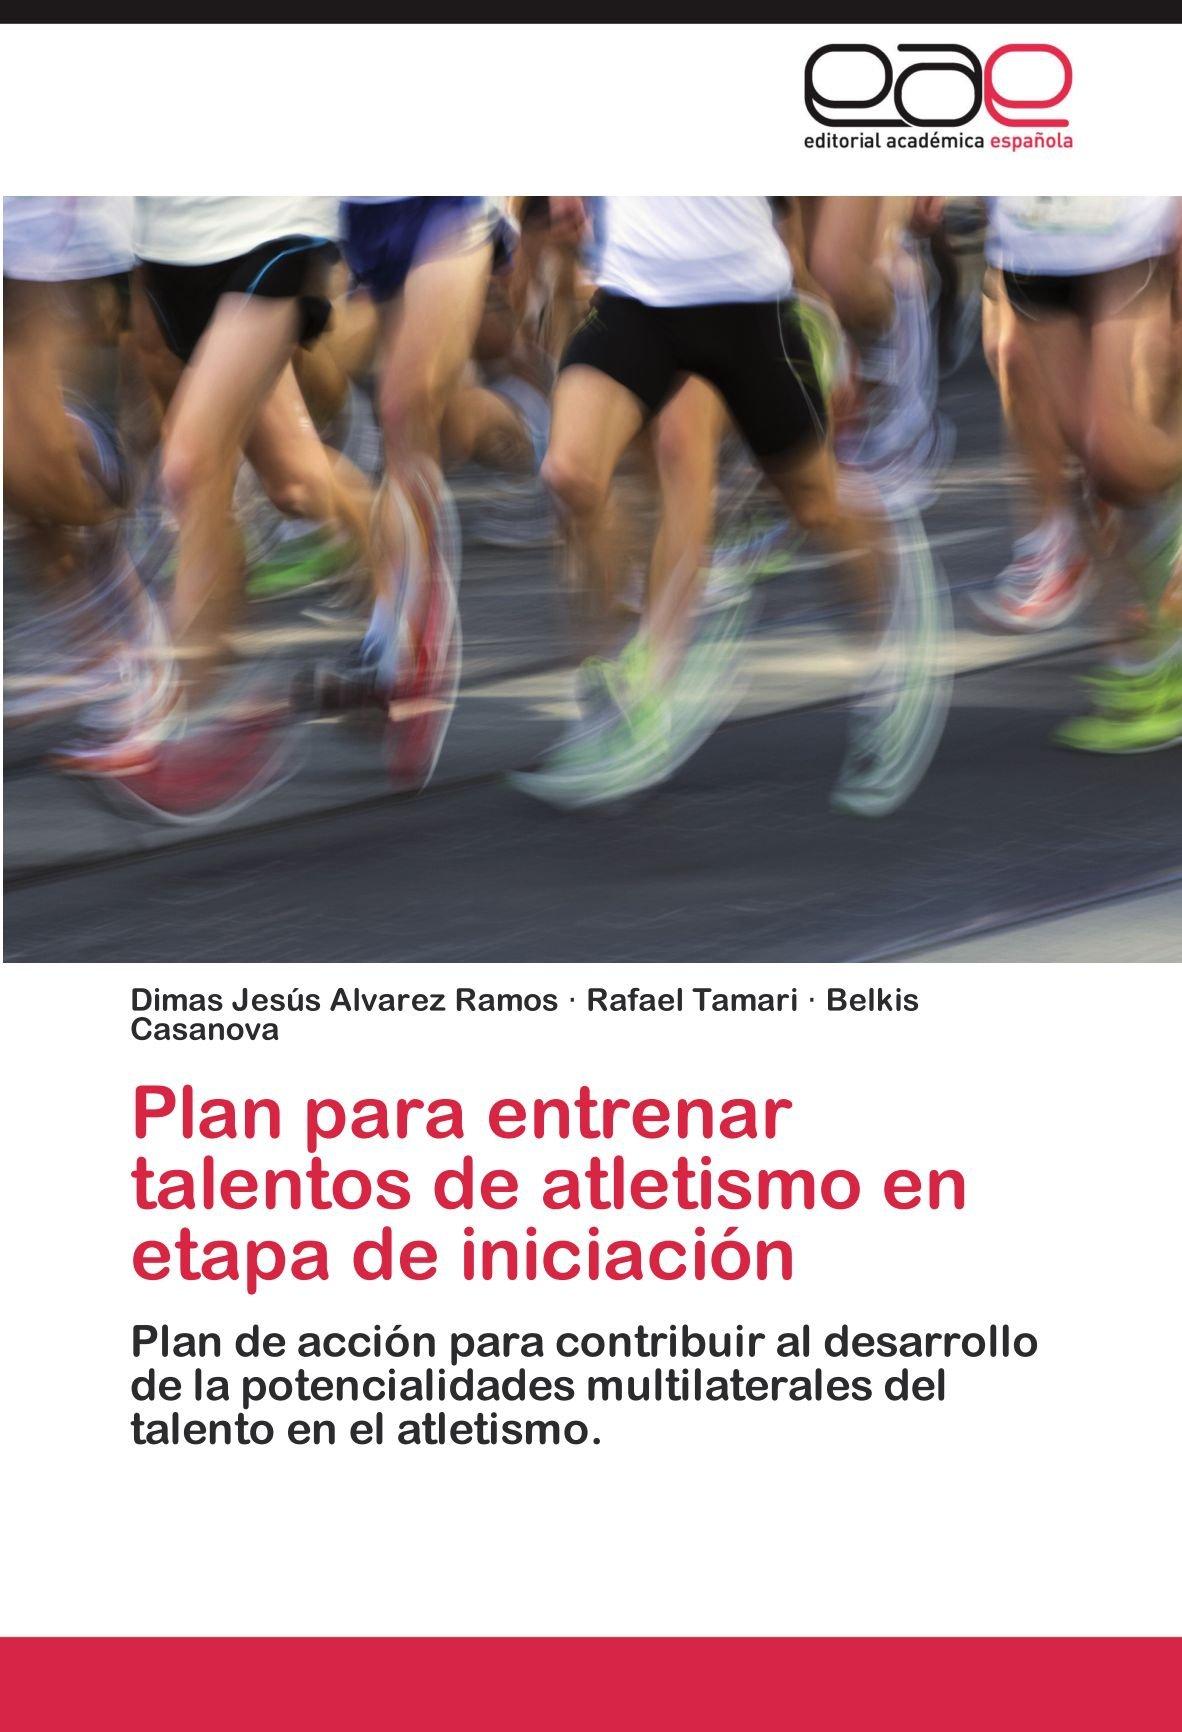 Plan Para Entrenar Talentos de Atletismo En Etapa de Iniciacion: Amazon.es: Alvarez Ramos, Dimas Jes, Tamari, Rafael, Casanova, Belkis: Libros